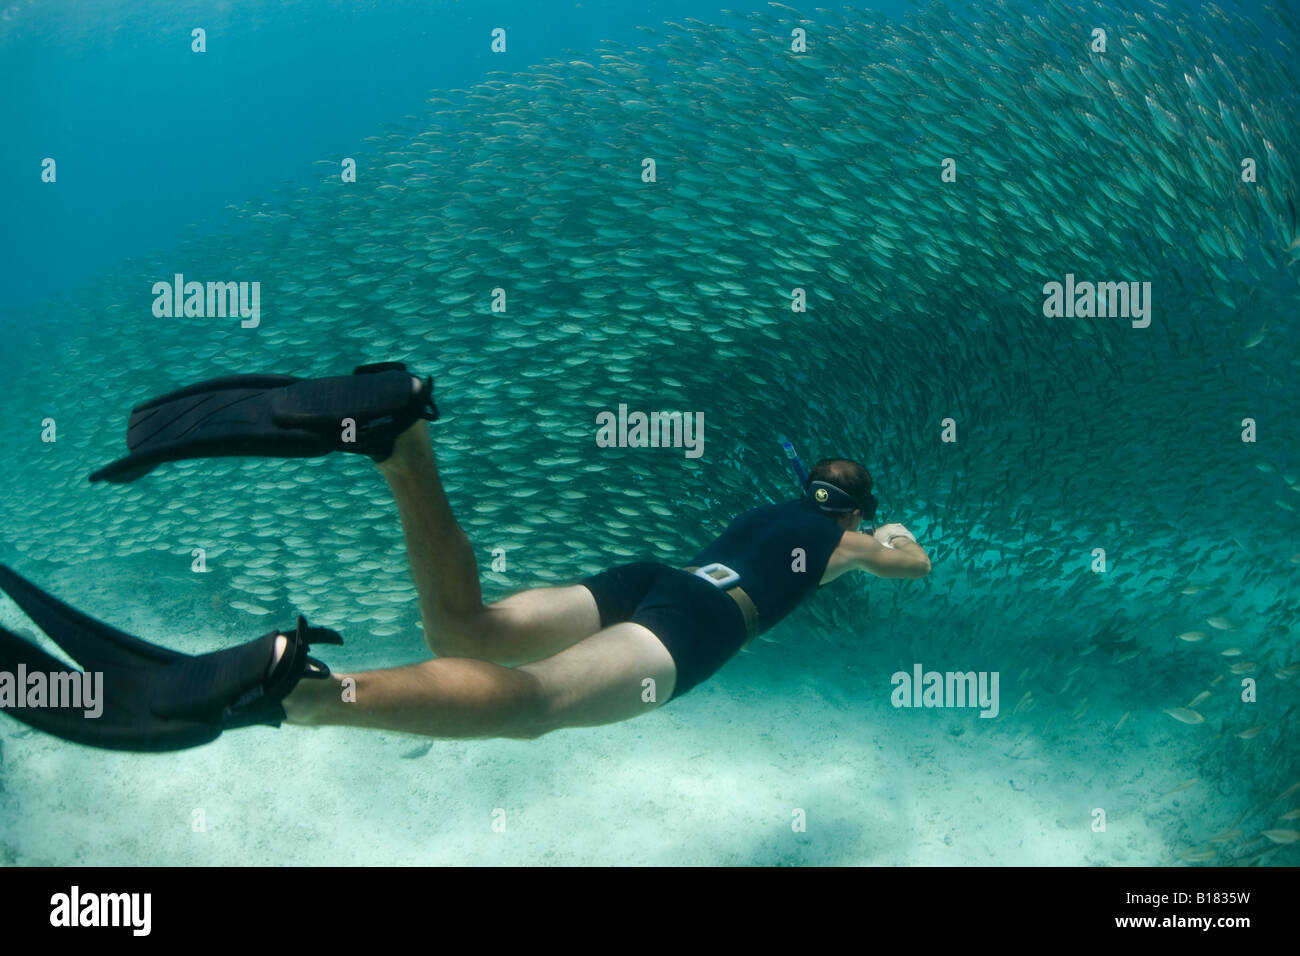 Freediver swims through massive school of fish Raja Ampat West Papua Indonesia - Stock Image